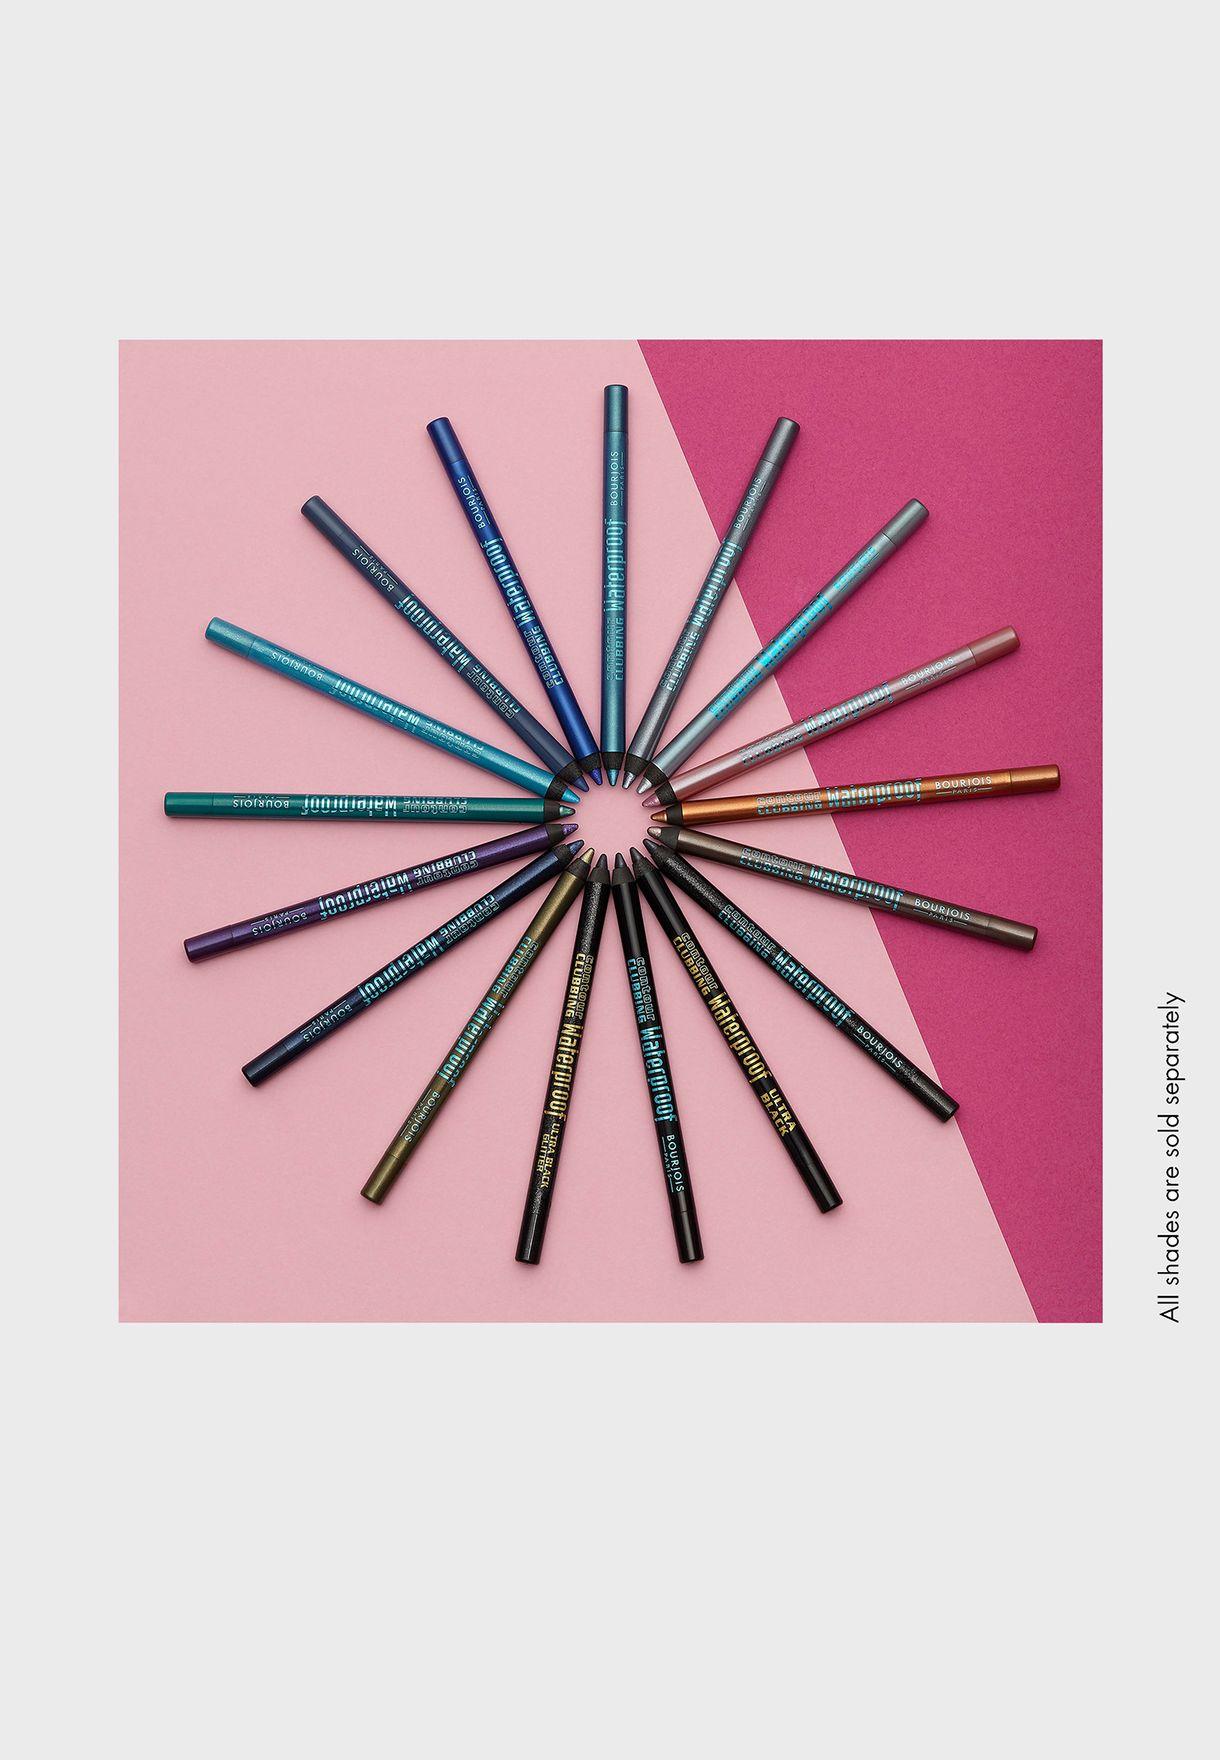 Bourjois Contour Clubbing Waterproof. Pencil & Liner. 69 Rosing star, 1.2 g